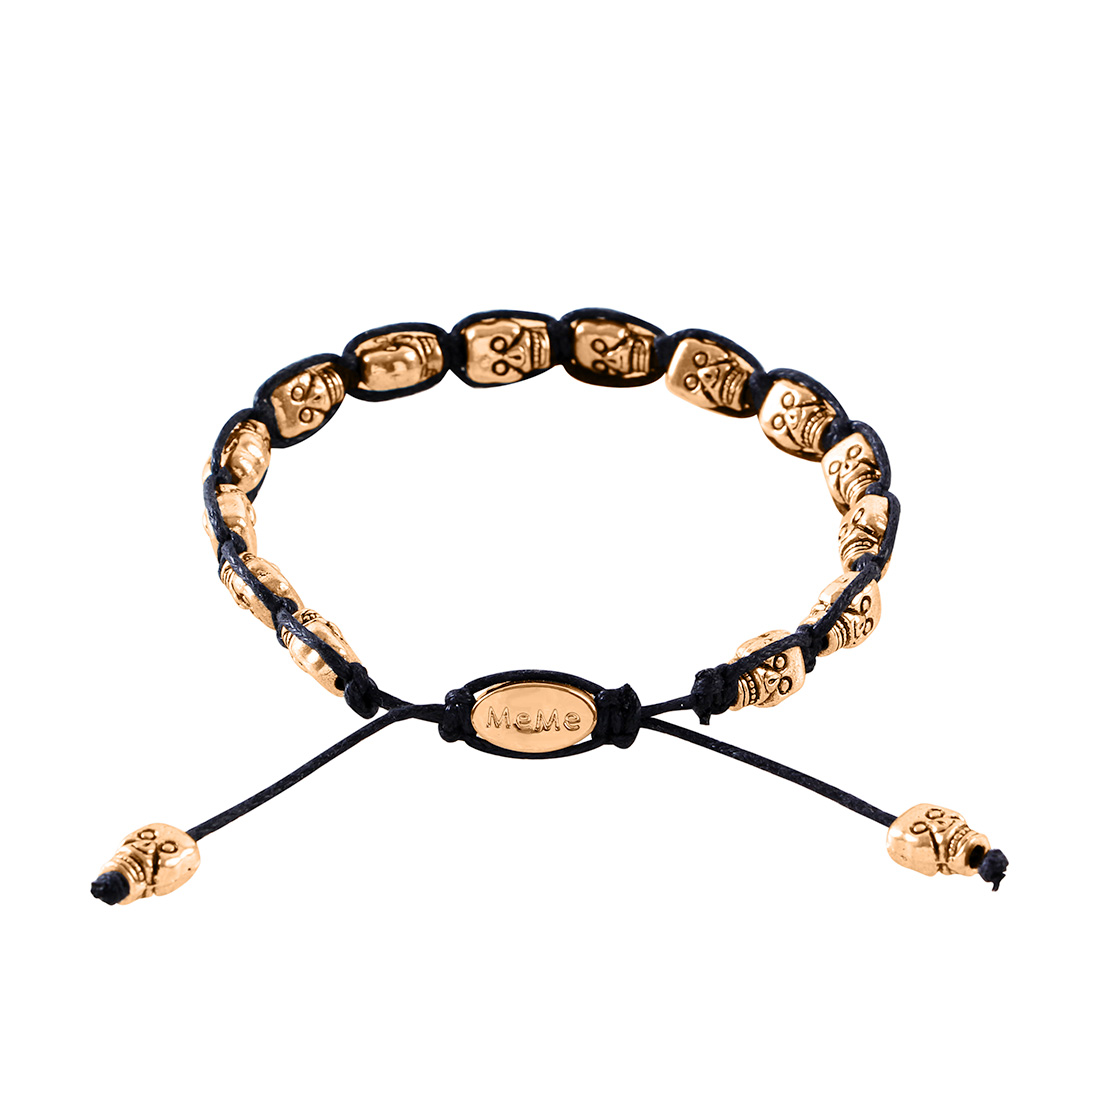 Bridal Shoes Harvey Nichols: MeMe London Rock On Men S Bracelet